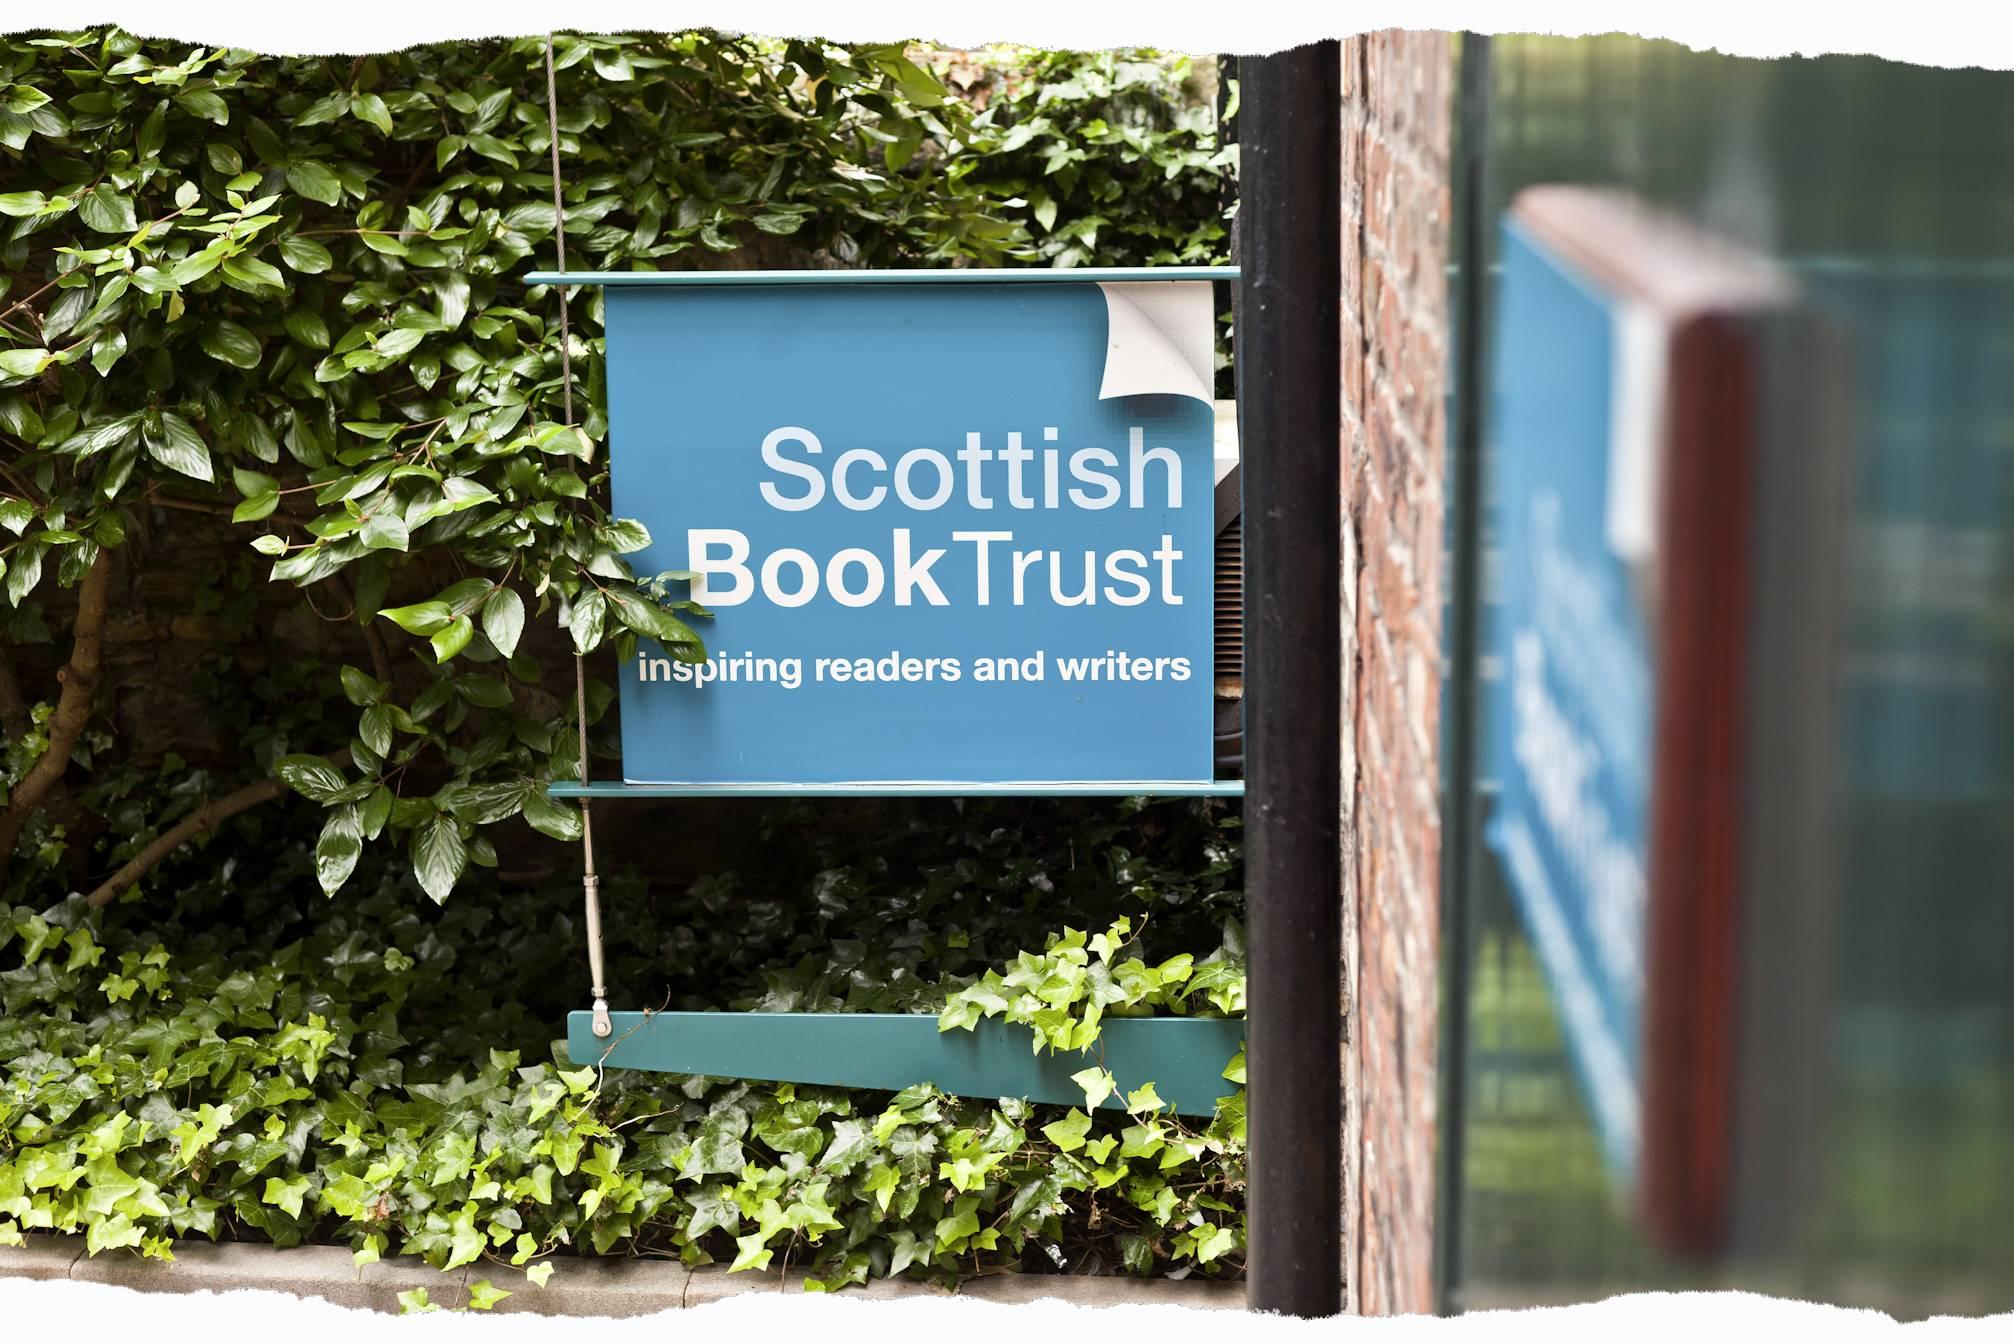 scottish-book-trust-sbt-sign-outside